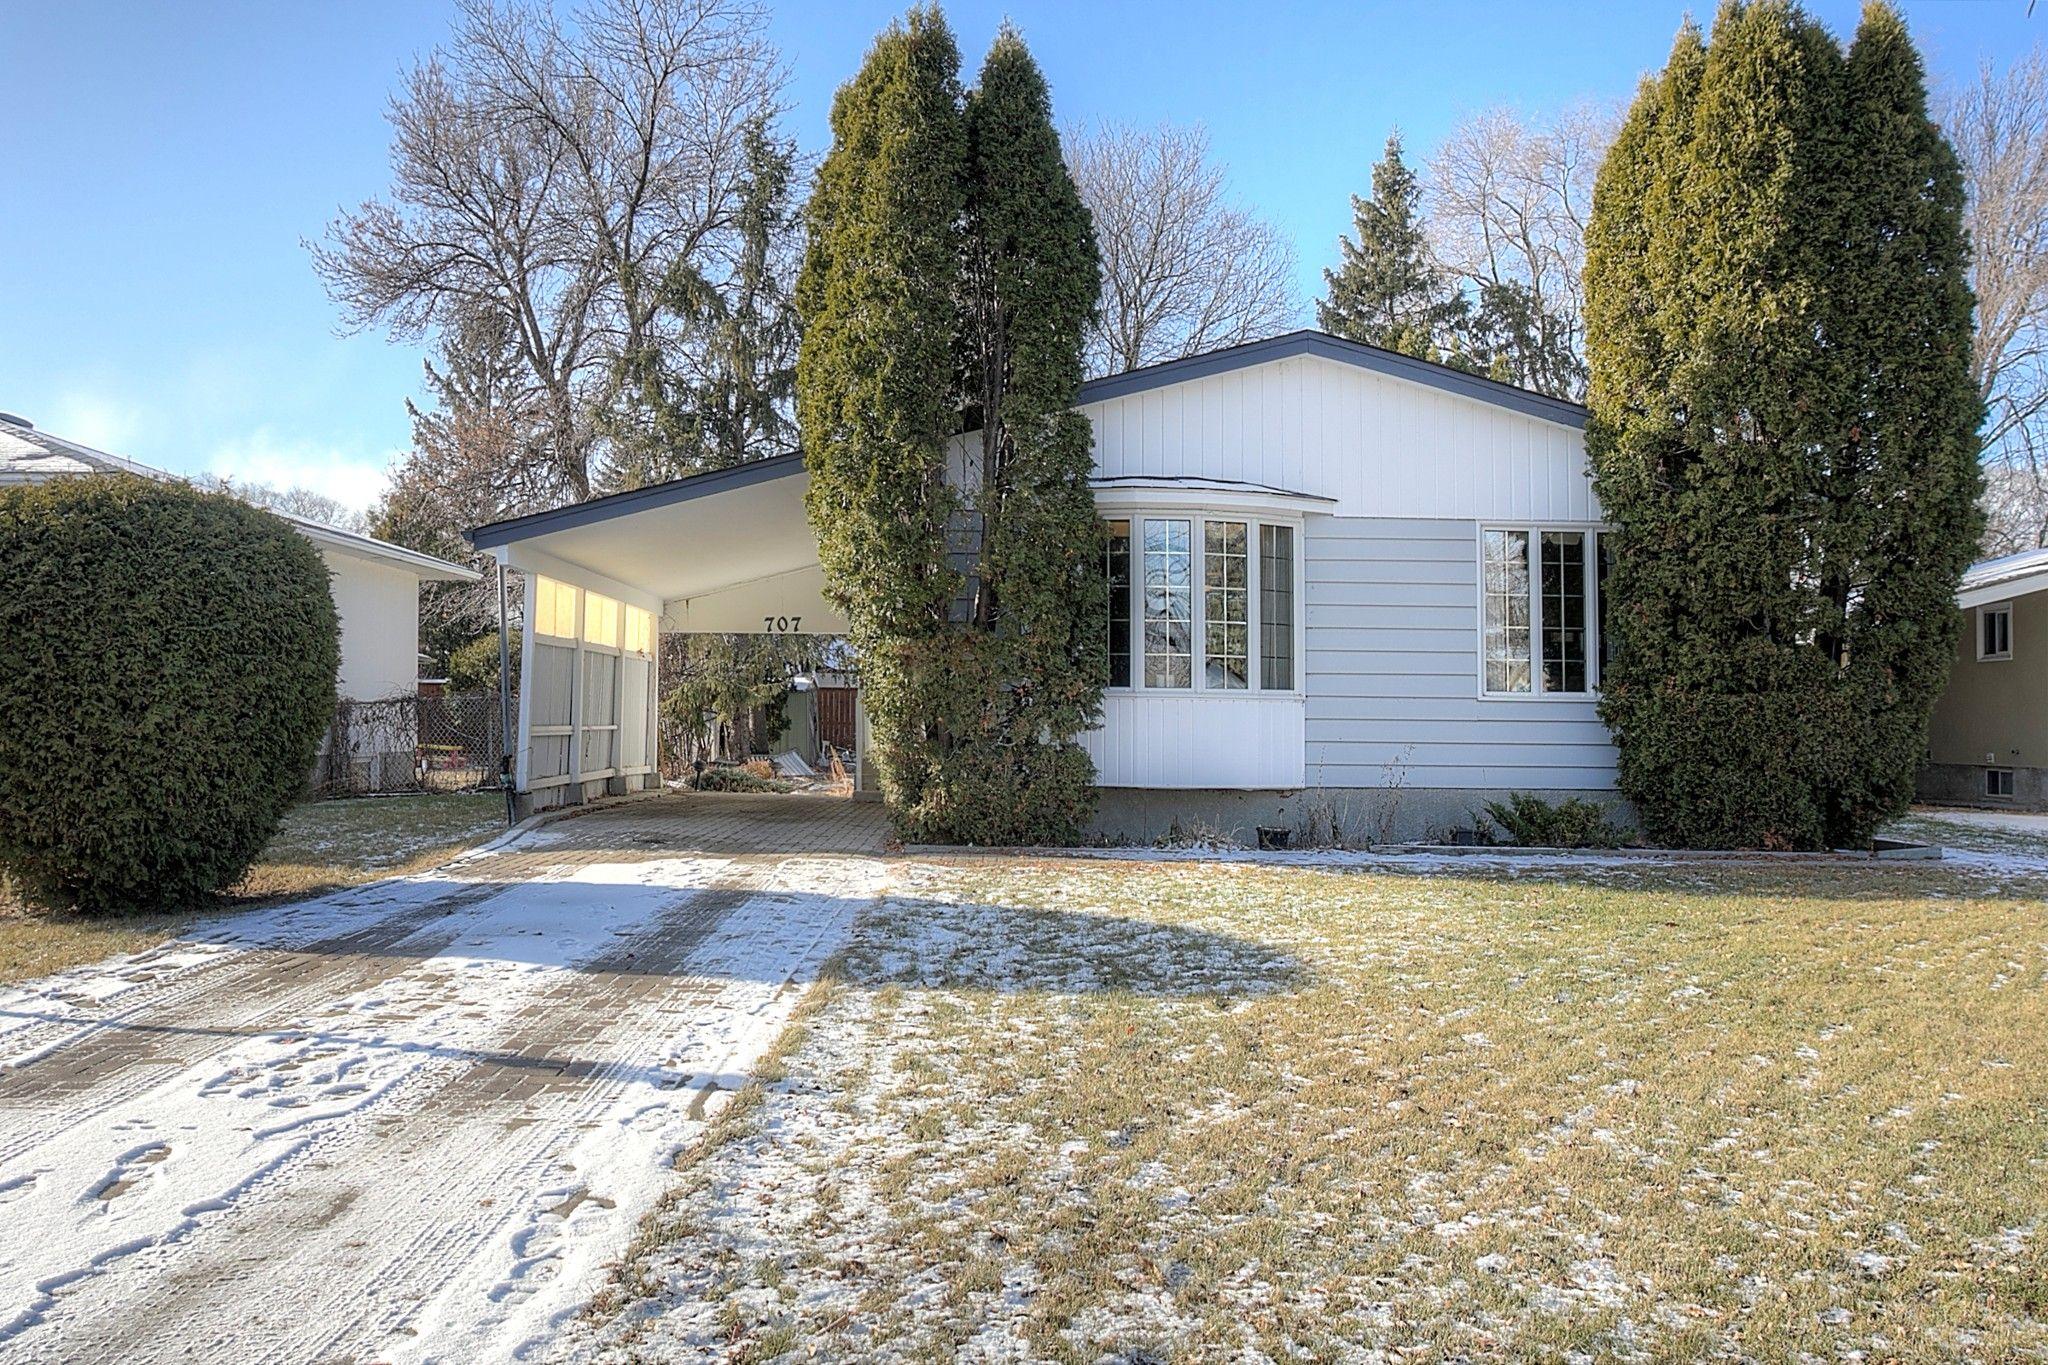 Main Photo: 707 Grierson Avenue in Winnipeg: Fort Richmond Single Family Detached for sale (1K)  : MLS®# 202028093